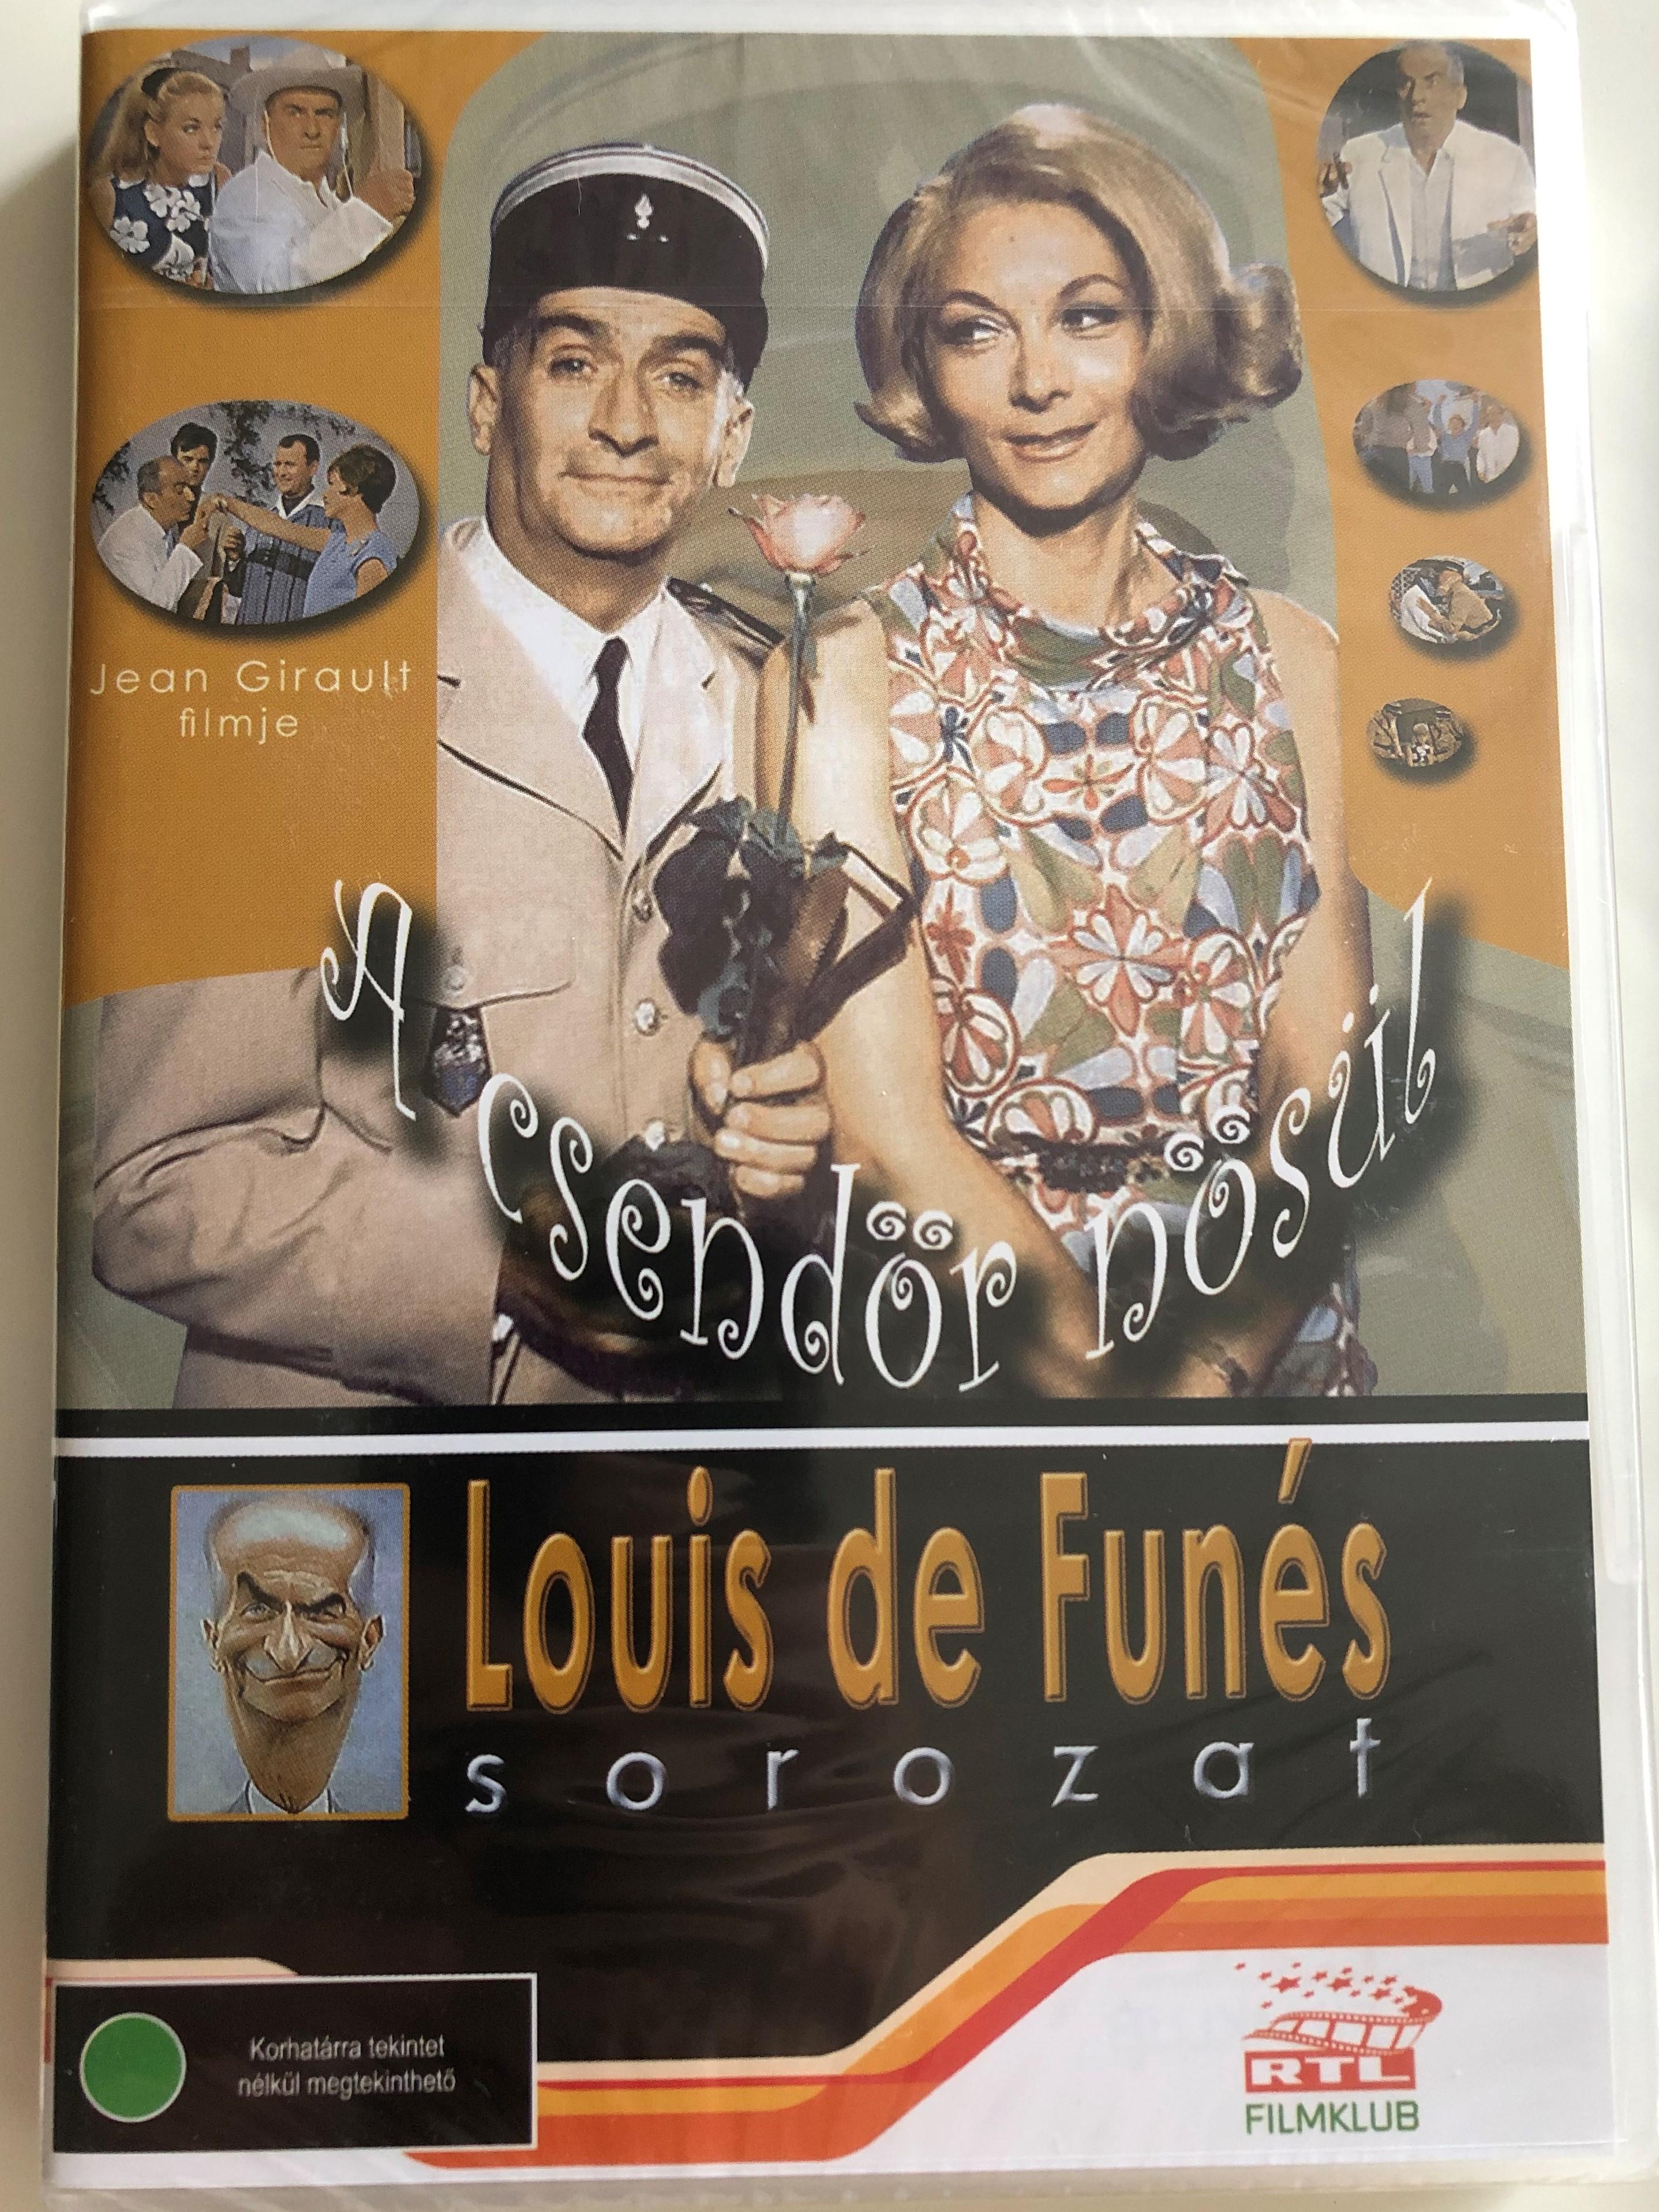 -le-gendarme-se-marie-dvd-1968-a-csend-r-n-s-l-the-gendarme-gets-married-directed-by-jean-girault-starring-louis-de-fun-s-claude-gensac-michel-galabru-louis-de-fun-s-sorozat-disc-2-1-.jpg